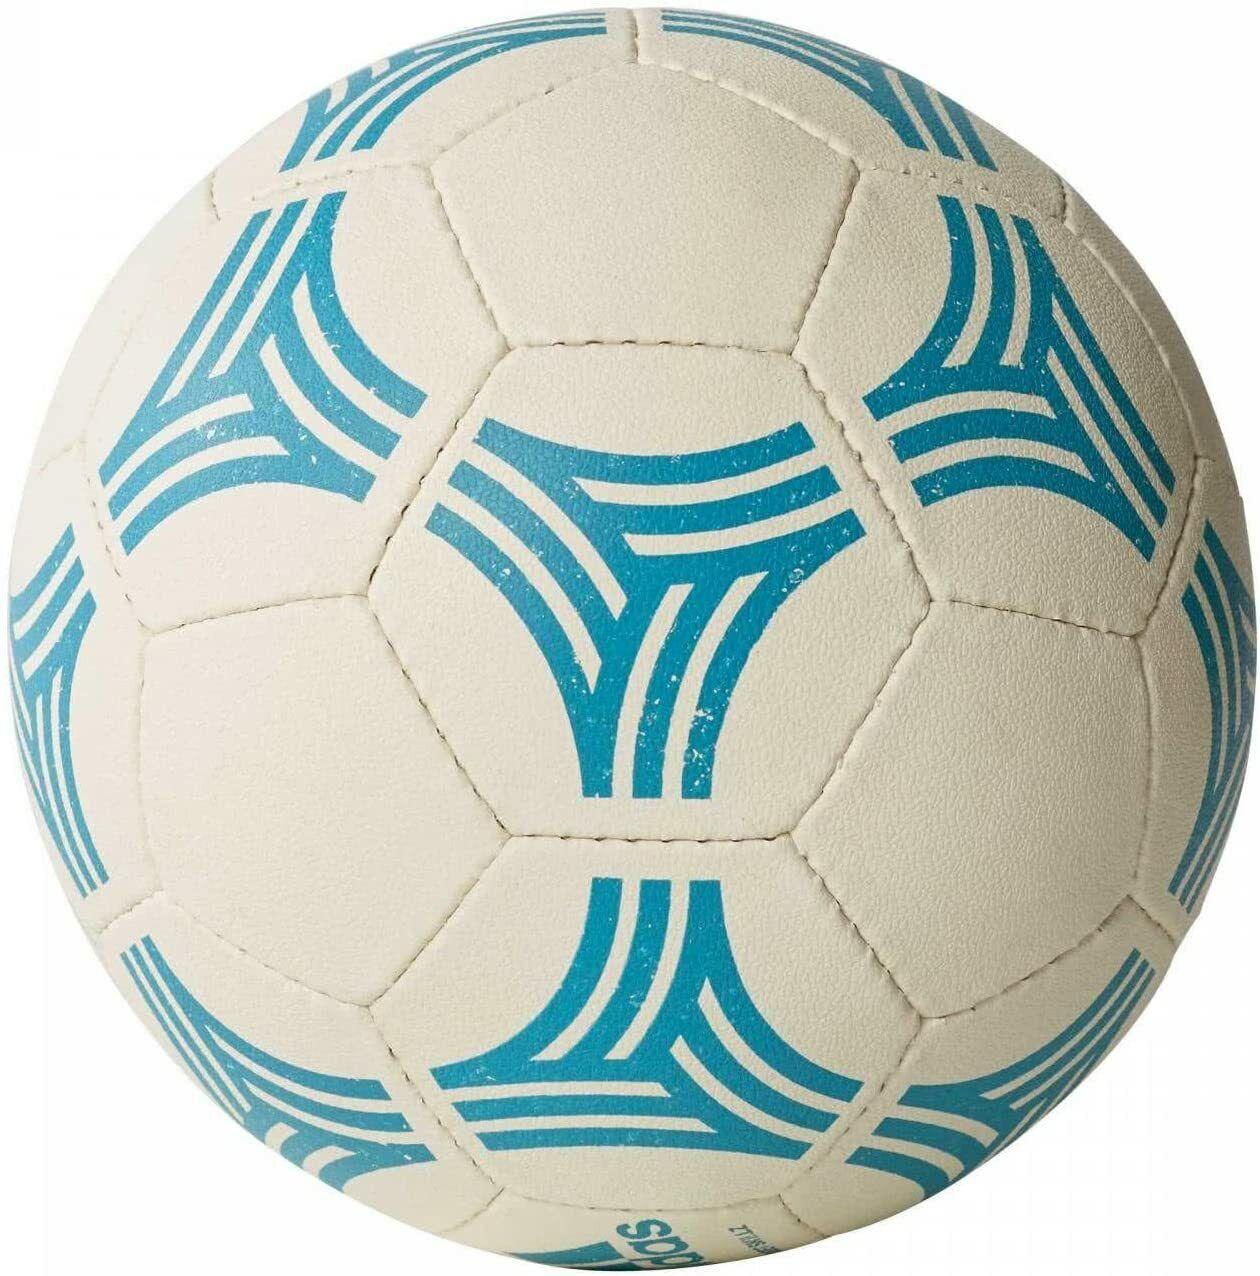 Adidas Tango Sala Futsal Fußball Trainingsball Hallenfussball Original Ball